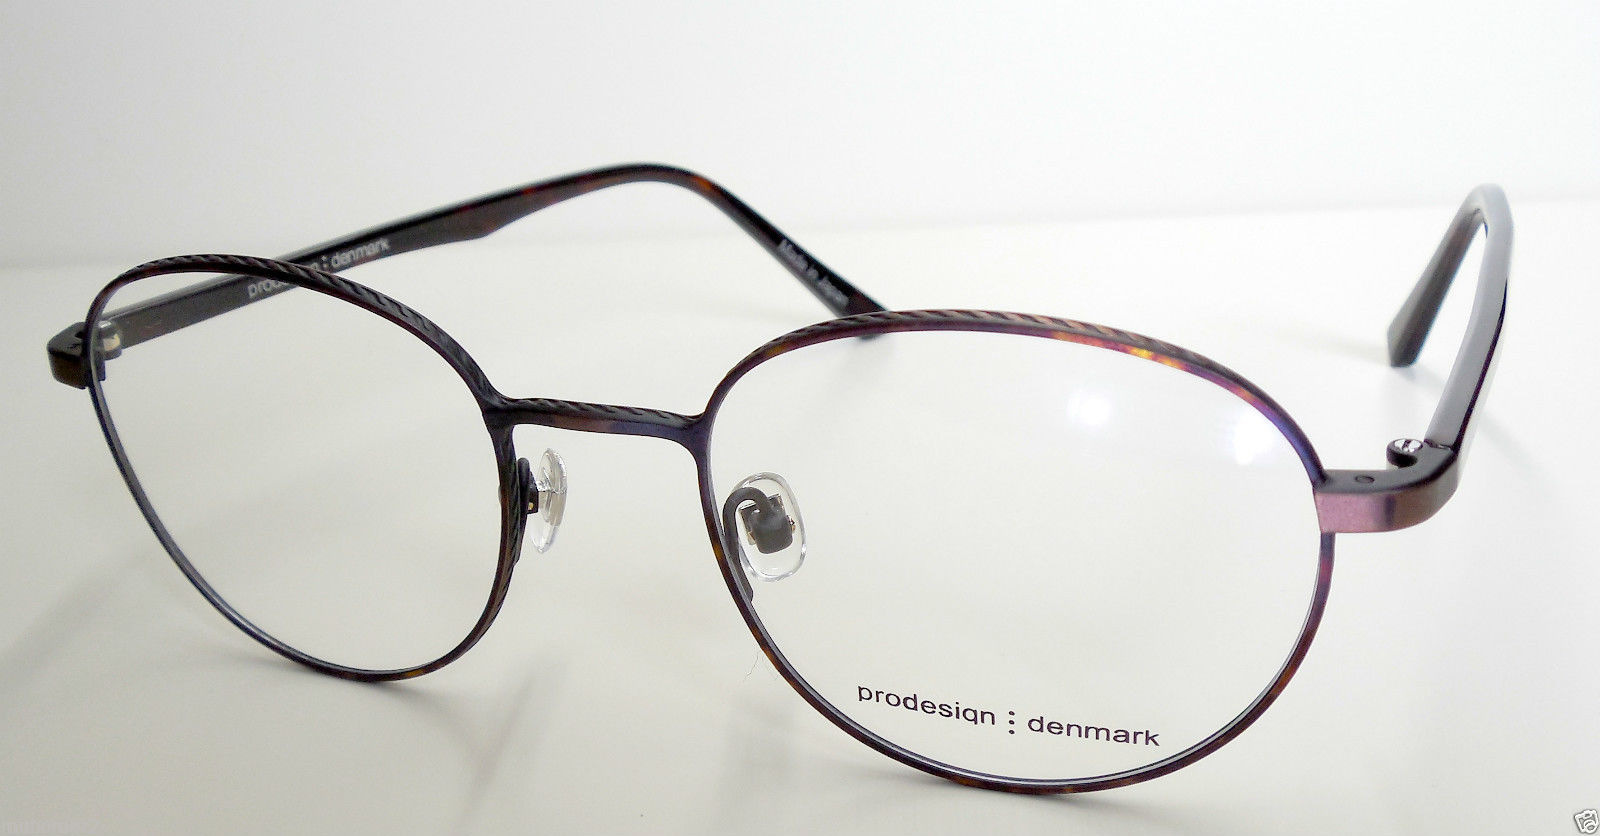 Prodesign Denmark Reading Glasses: 1 customer review and 2 listings